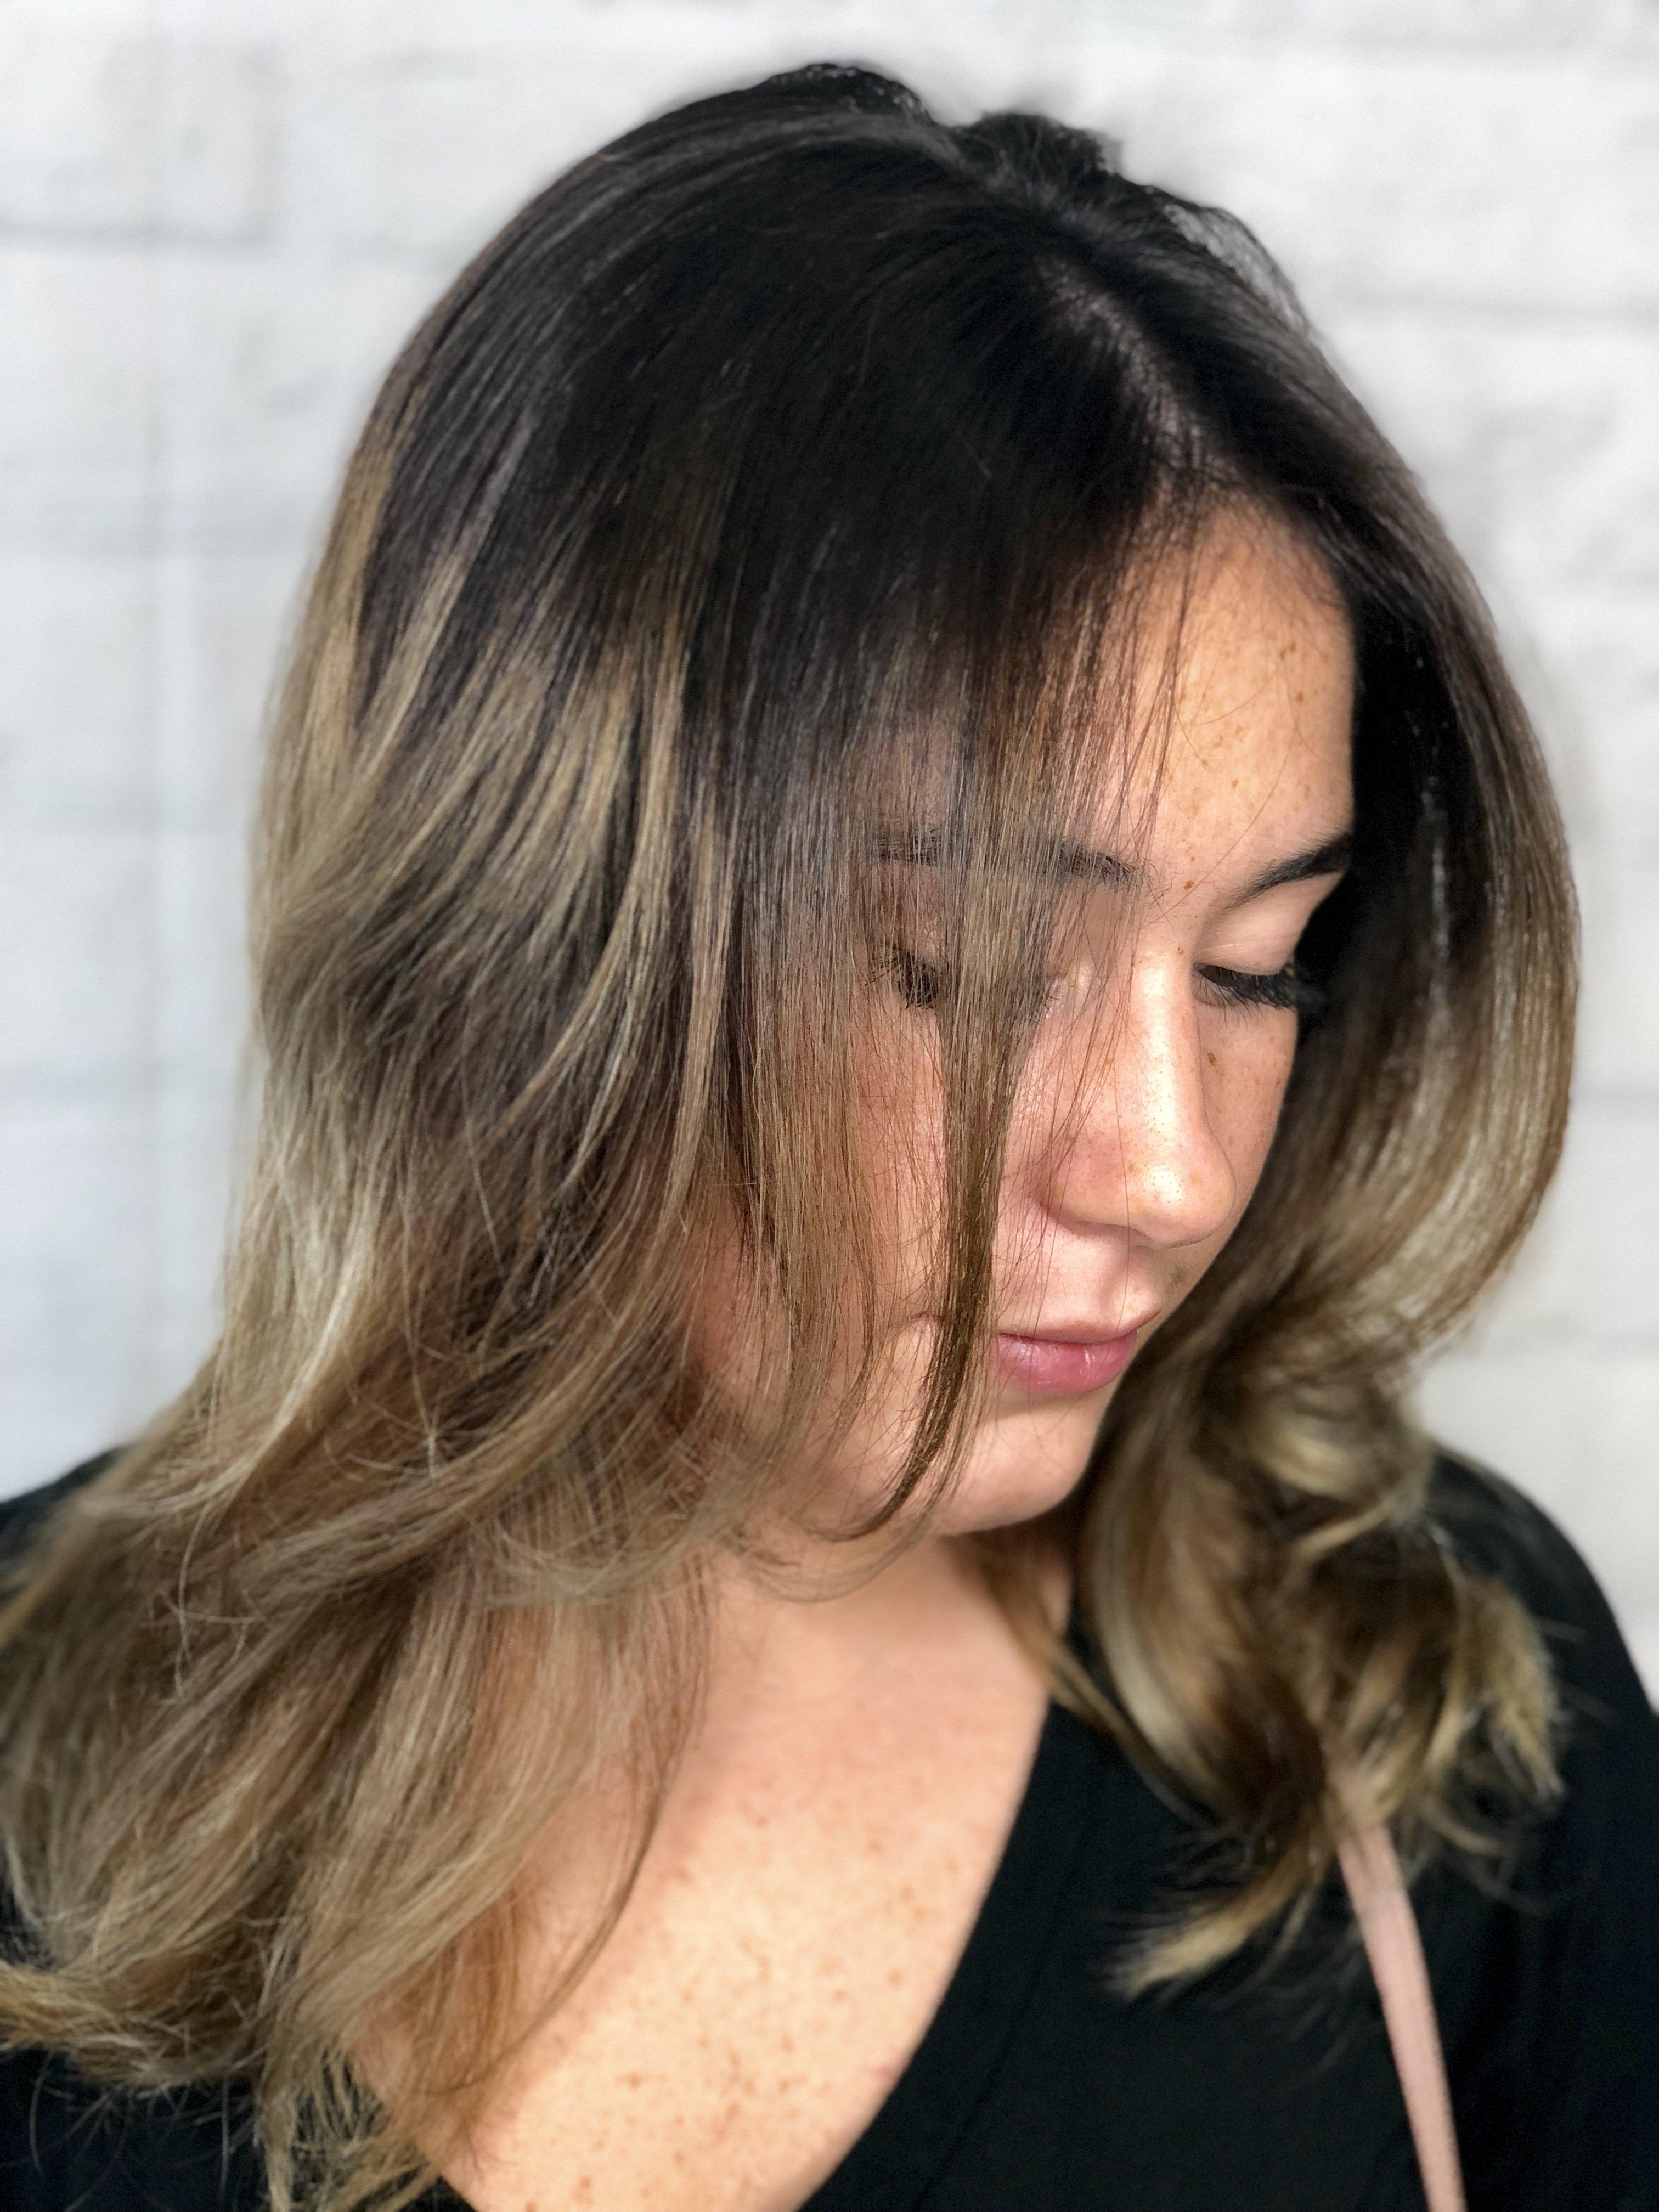 Hair by Melissa Capellini – Senior Stylist | Studio Trio Hair Salon